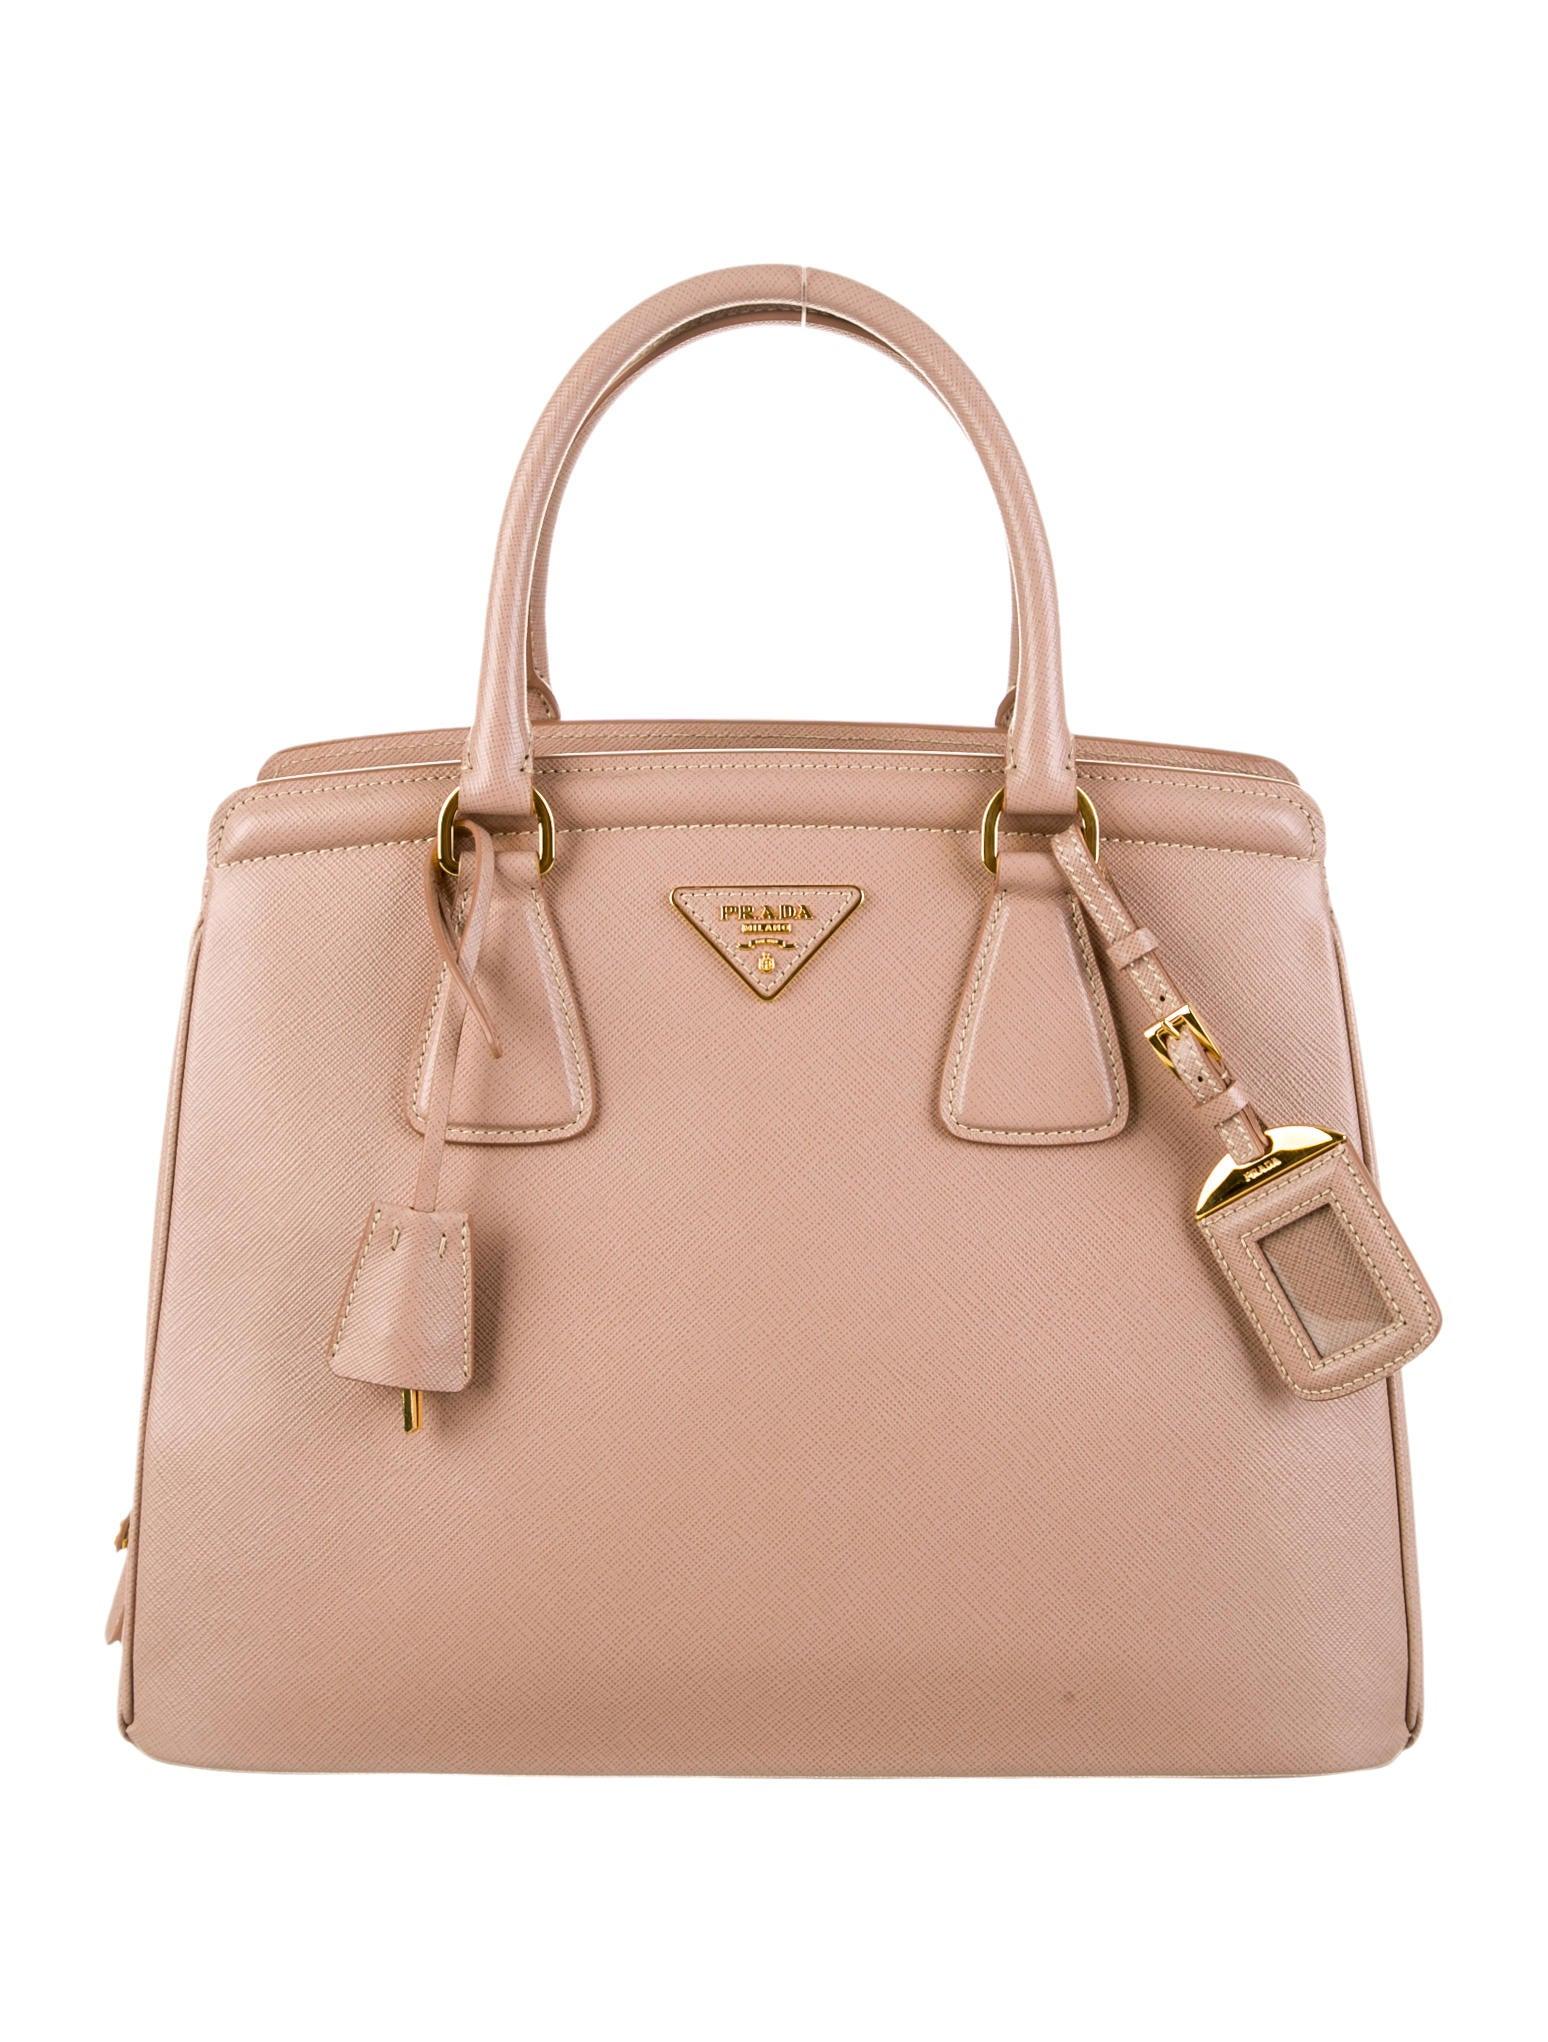 Prada Saffiano Parabole Tote - Handbags - PRA63104   The RealReal